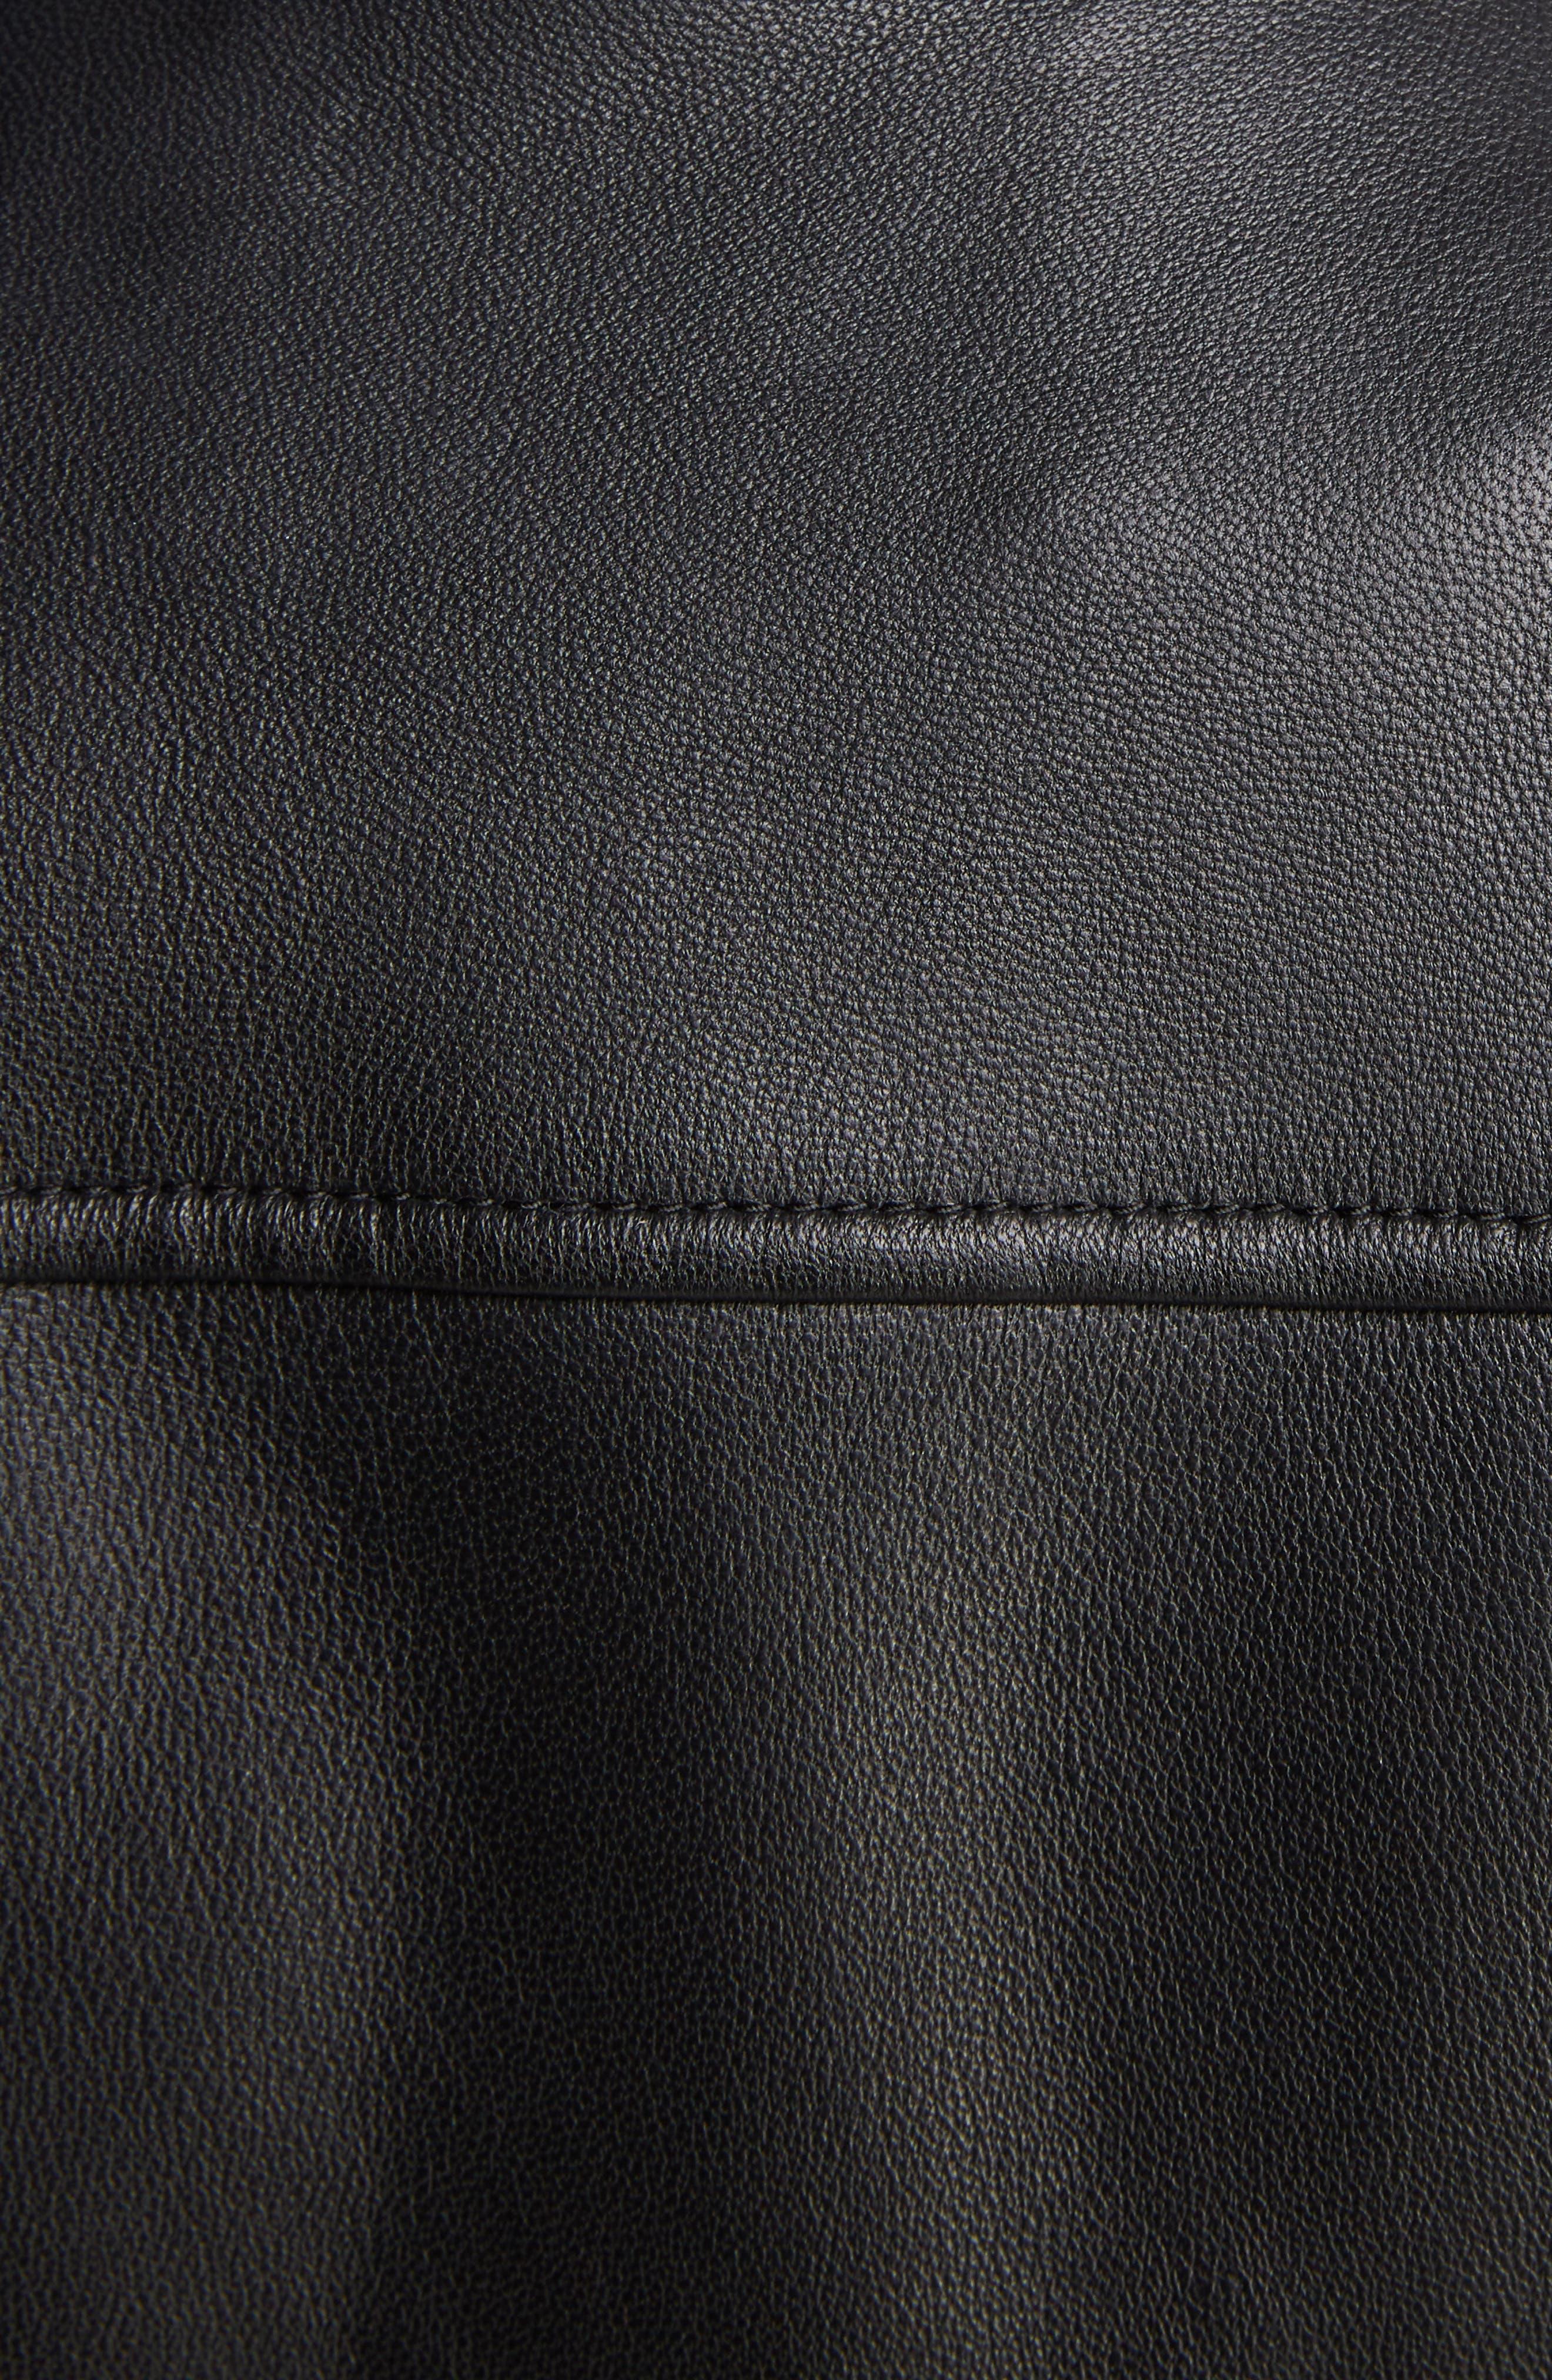 Lewis Leather Moto Jacket,                             Alternate thumbnail 5, color,                             BLACK